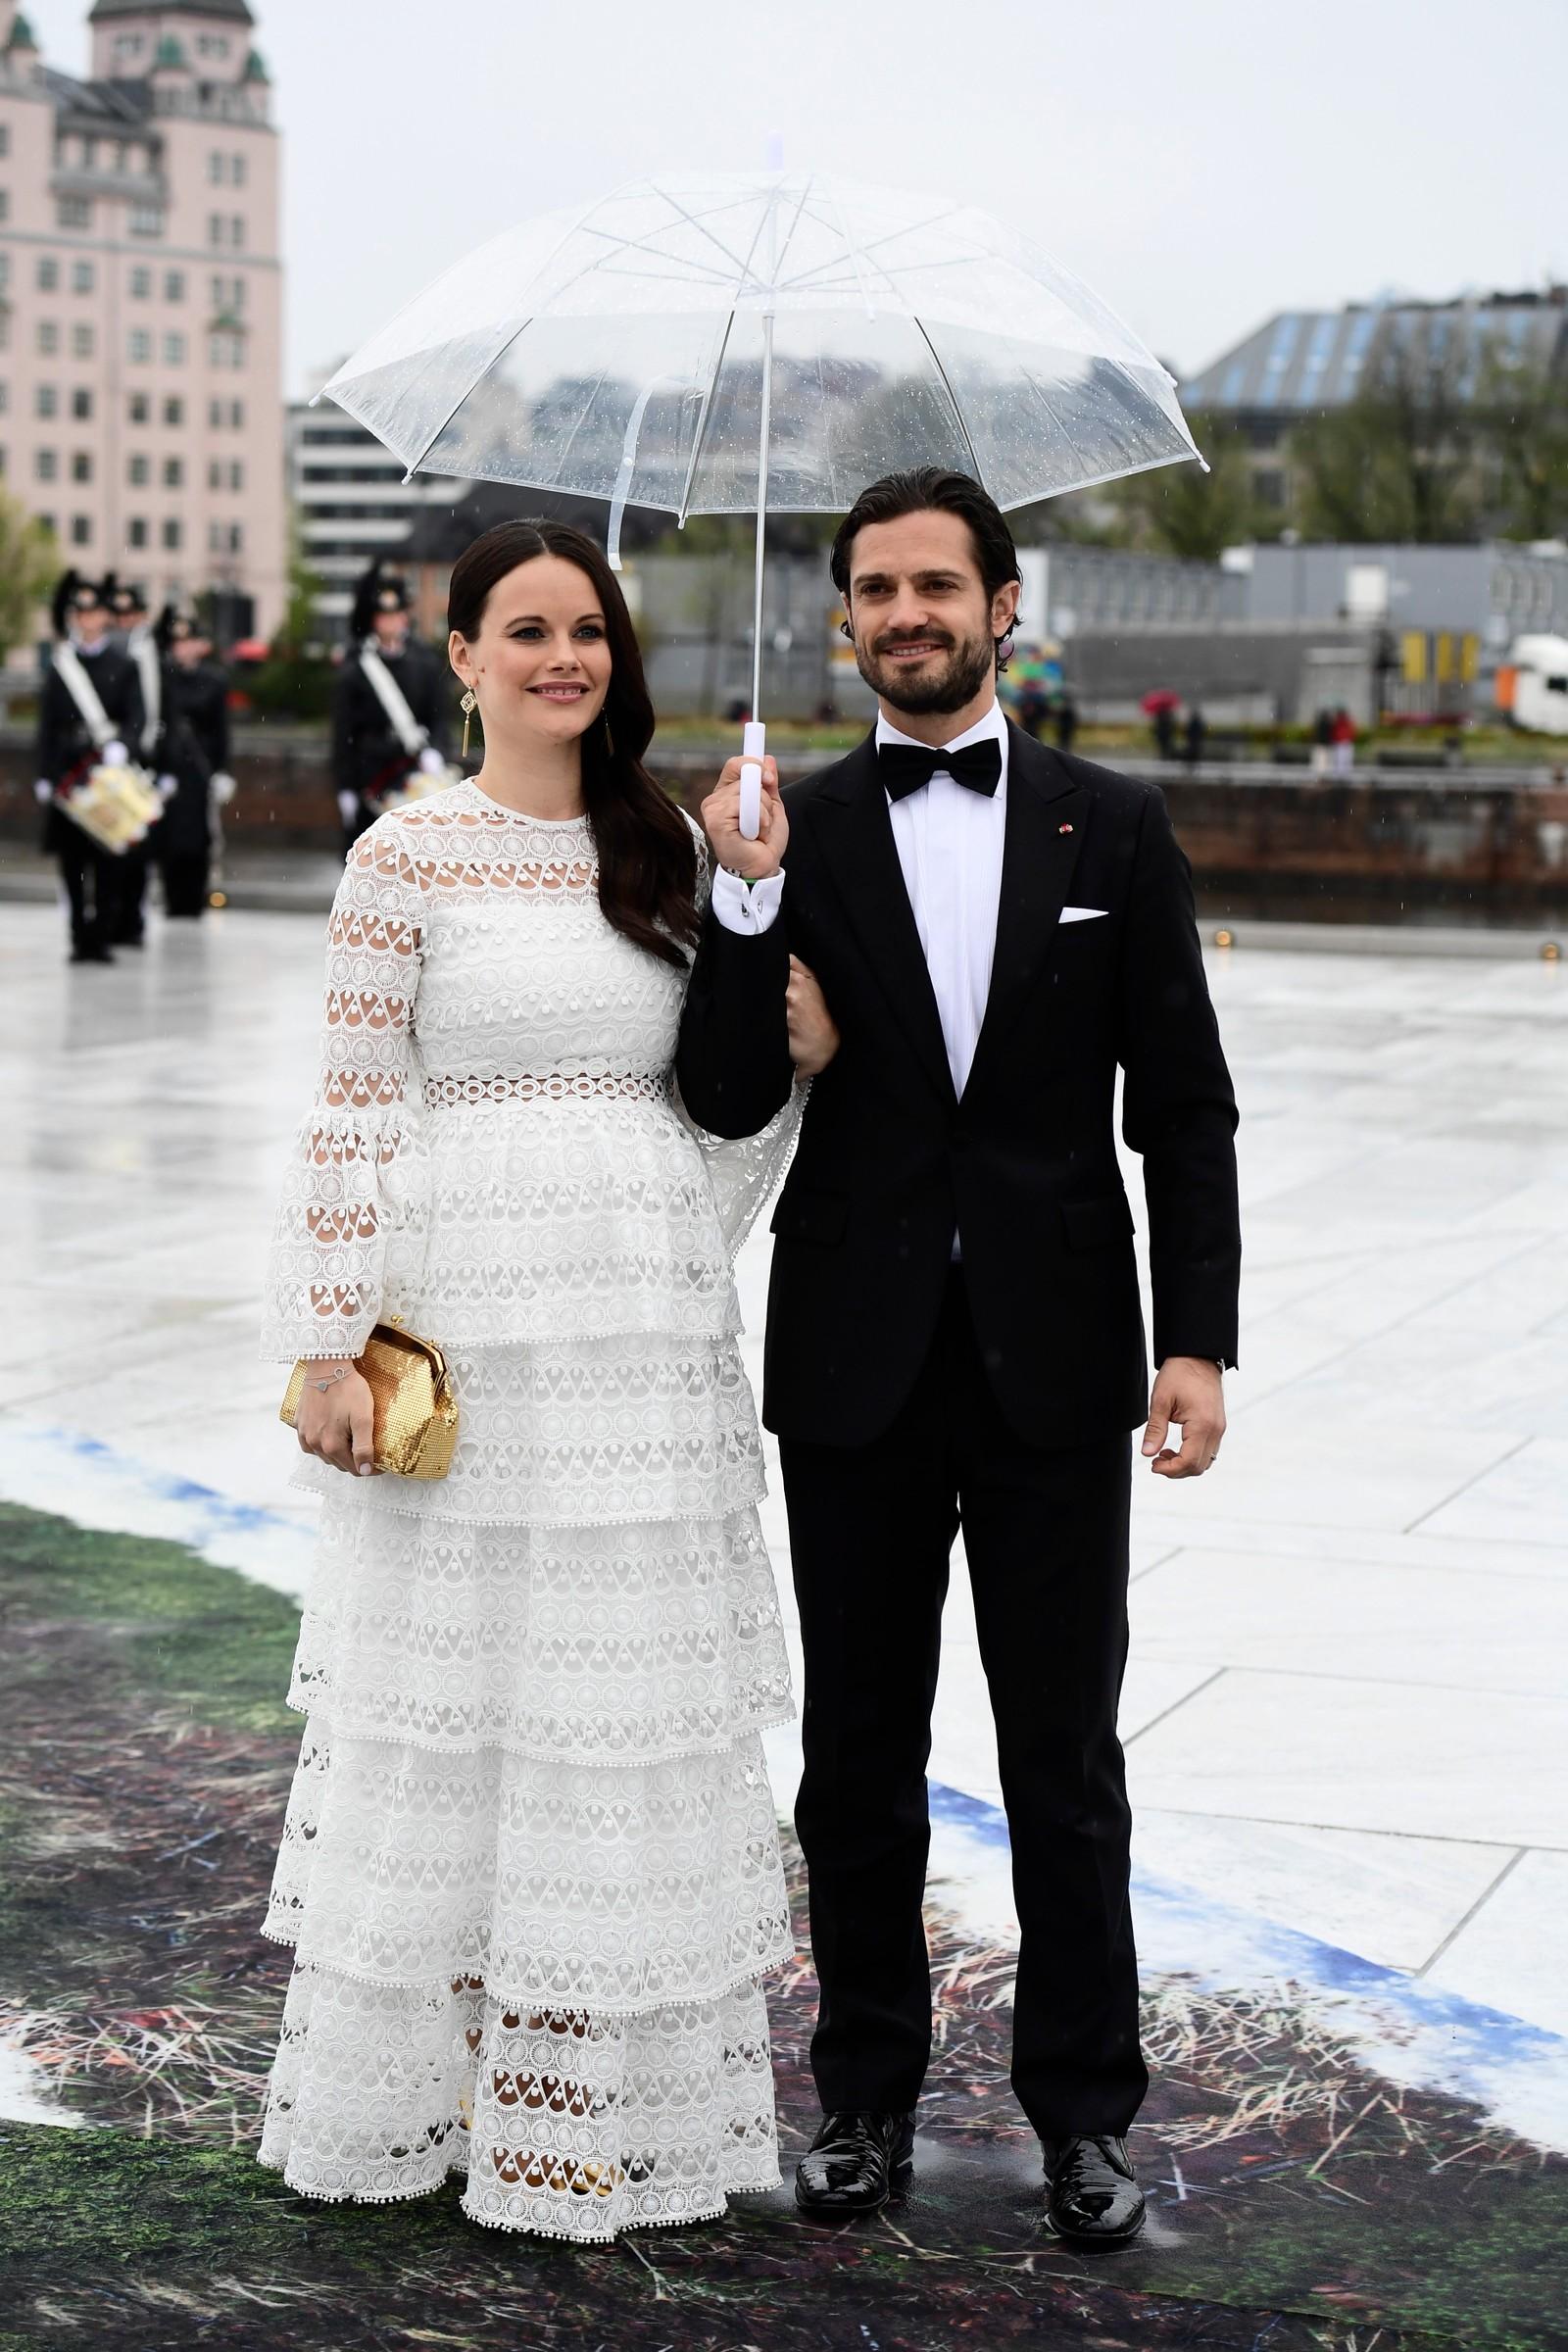 Sveriges prins Carl Philip og prinsesse Sofia venter barn nummer to i september.